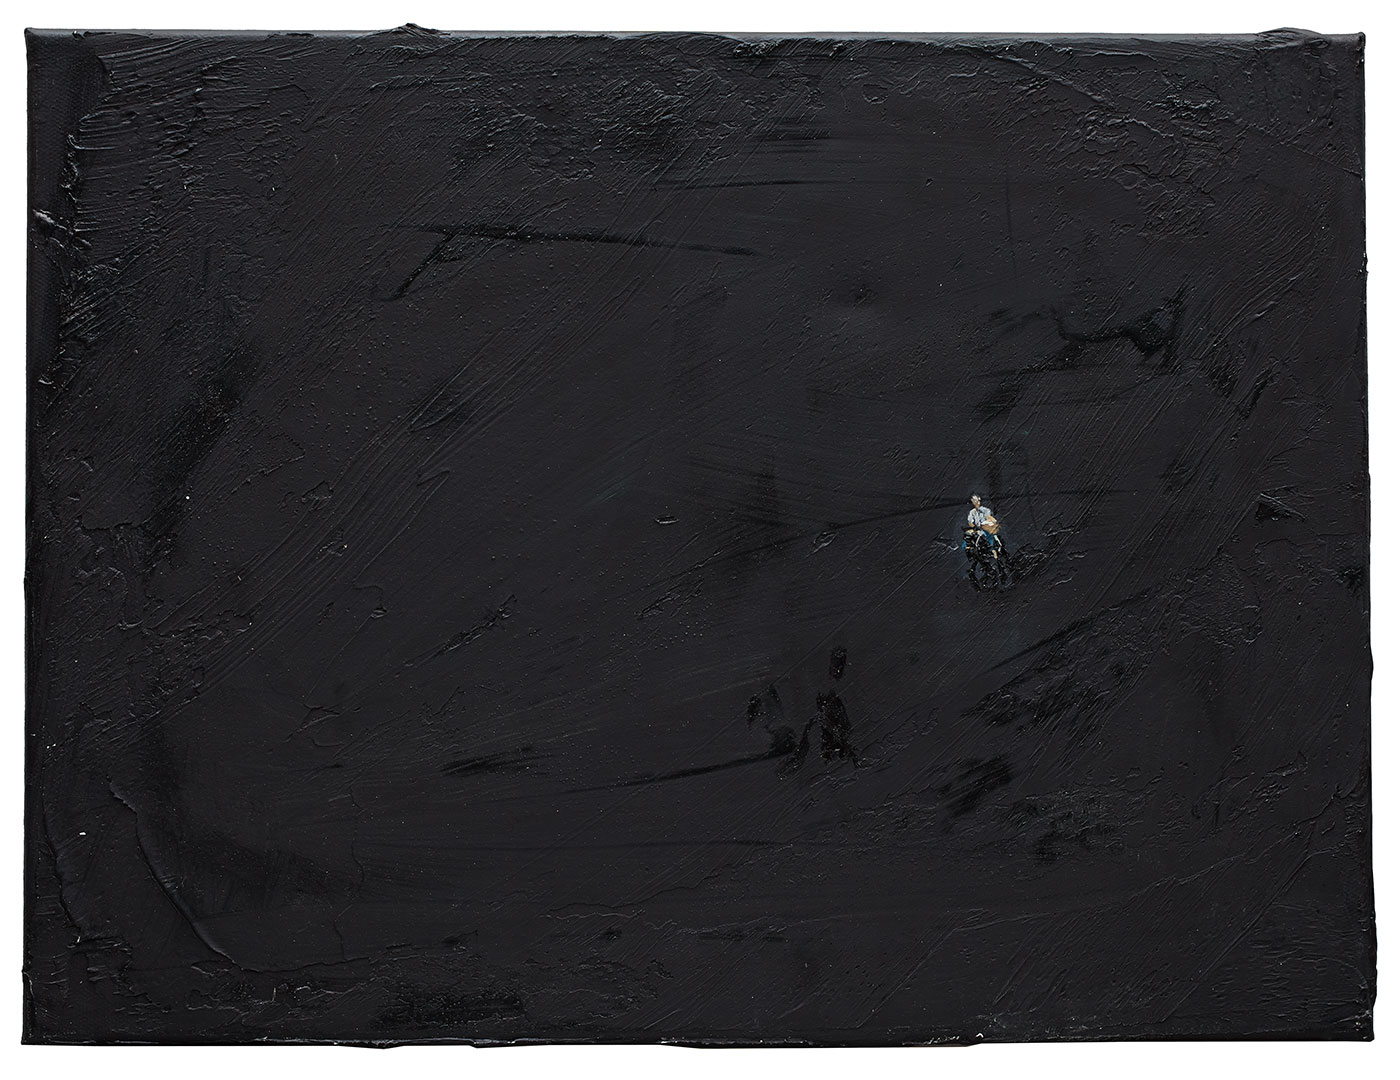 Paul J. Guzman - Untitled II